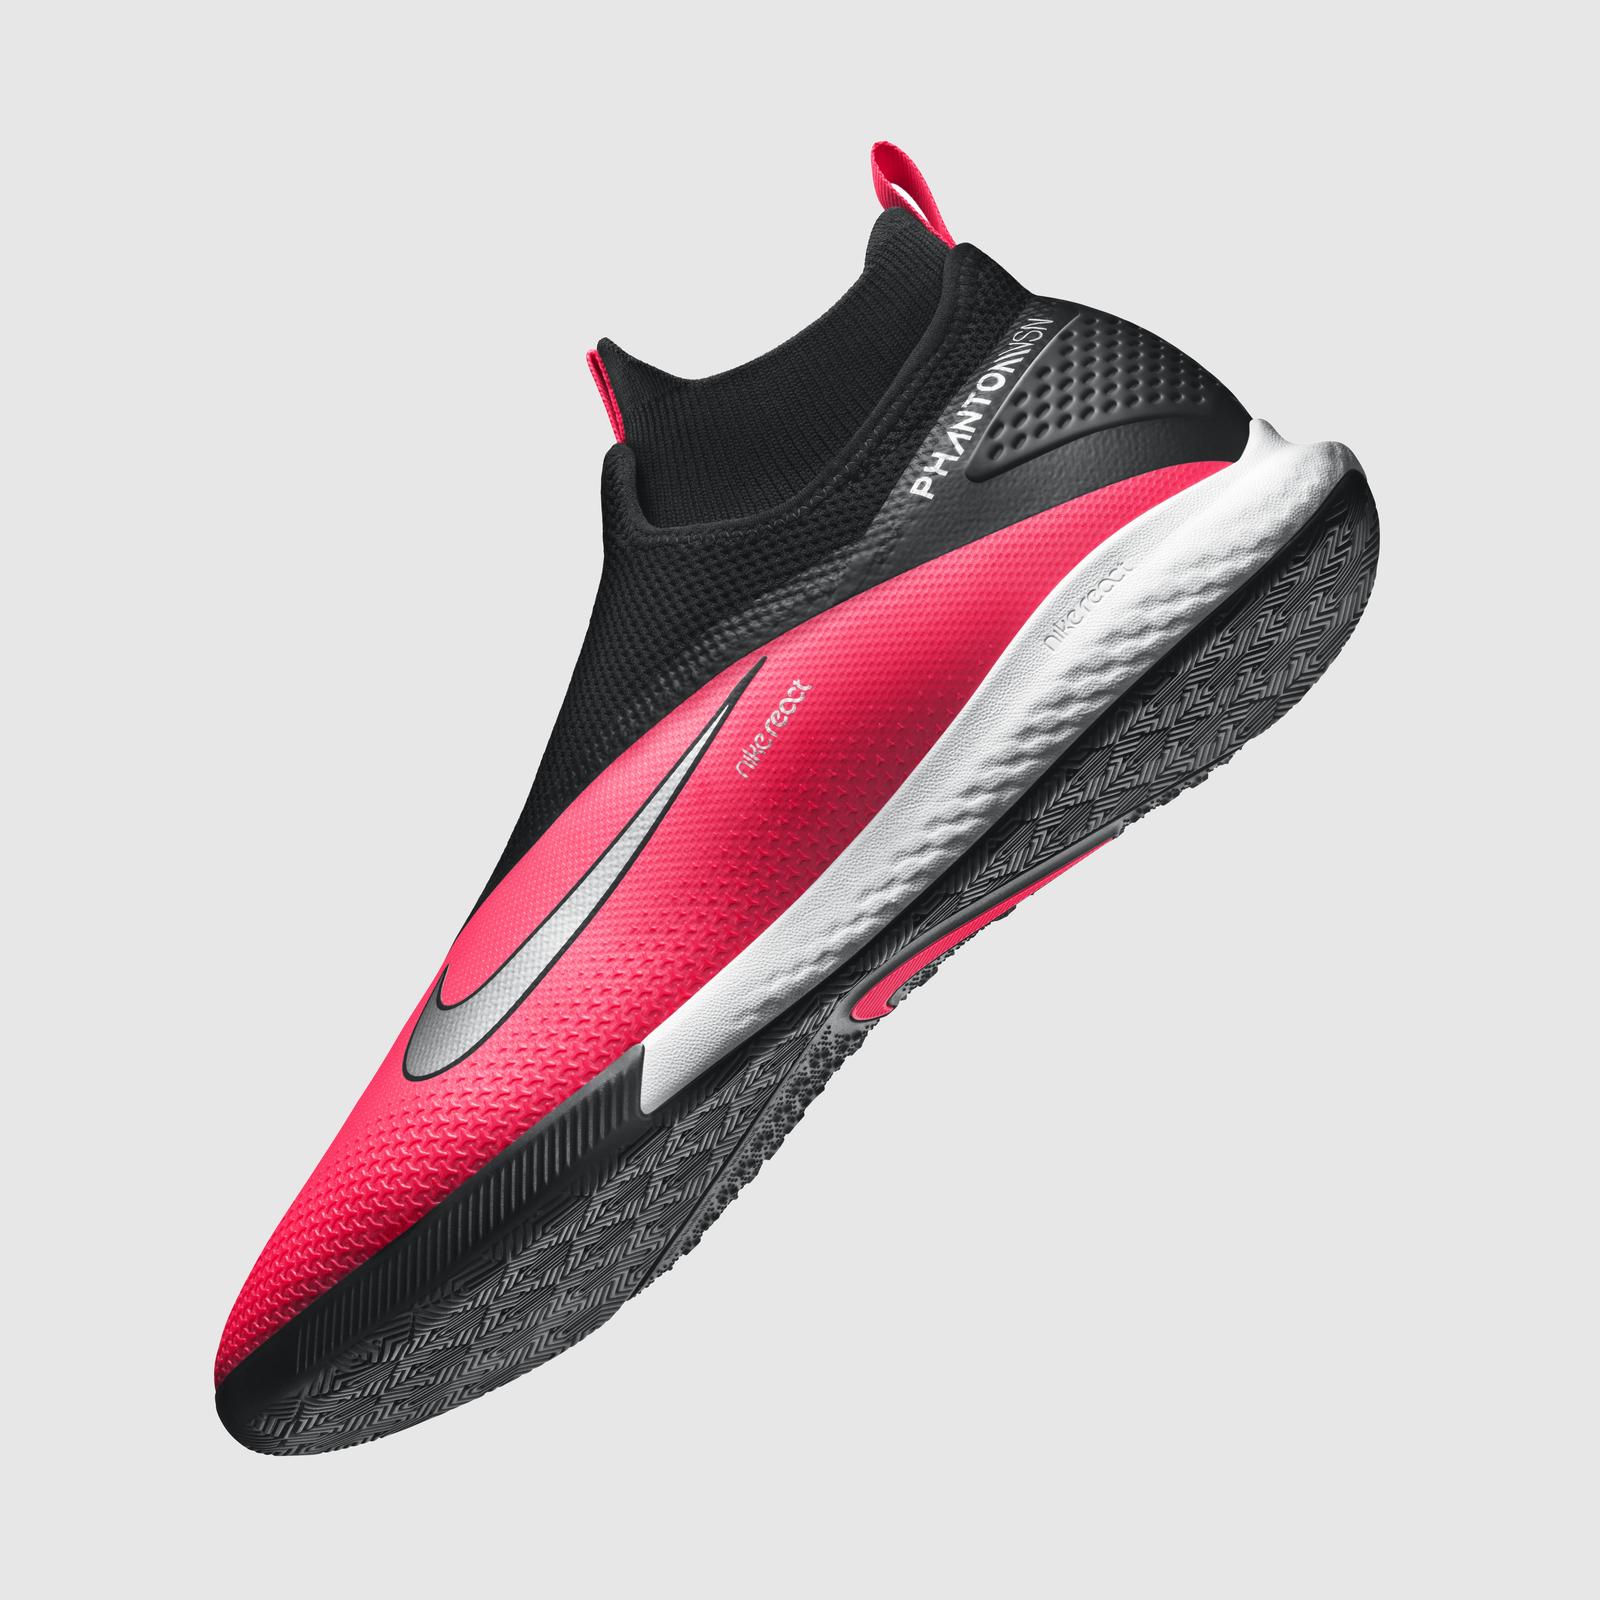 Nike Football Introduces Phantomvsn 2 In 2020 Best Soccer Shoes Nike Football Soccer Shoes